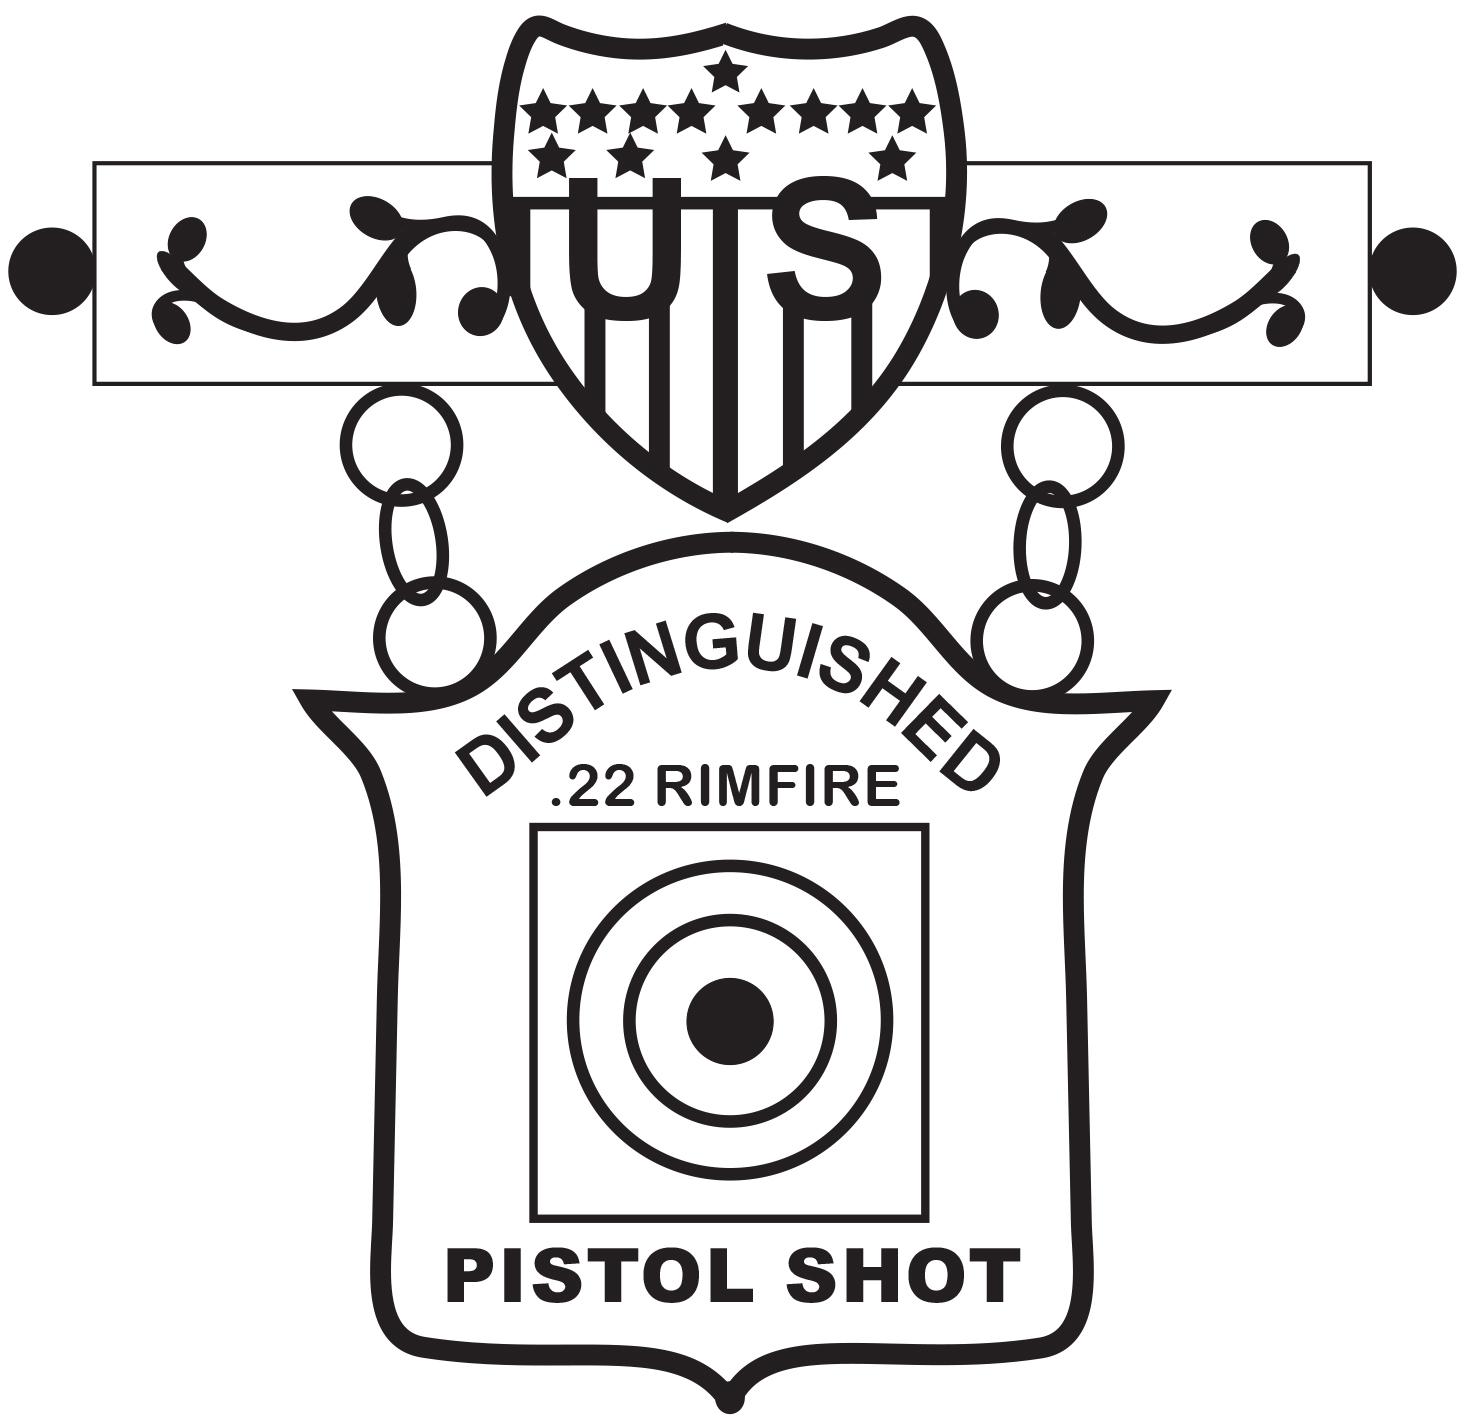 Rimfire pistol distinguished badge achievement pins get new eic 22 rimfire pistol badge buycottarizona